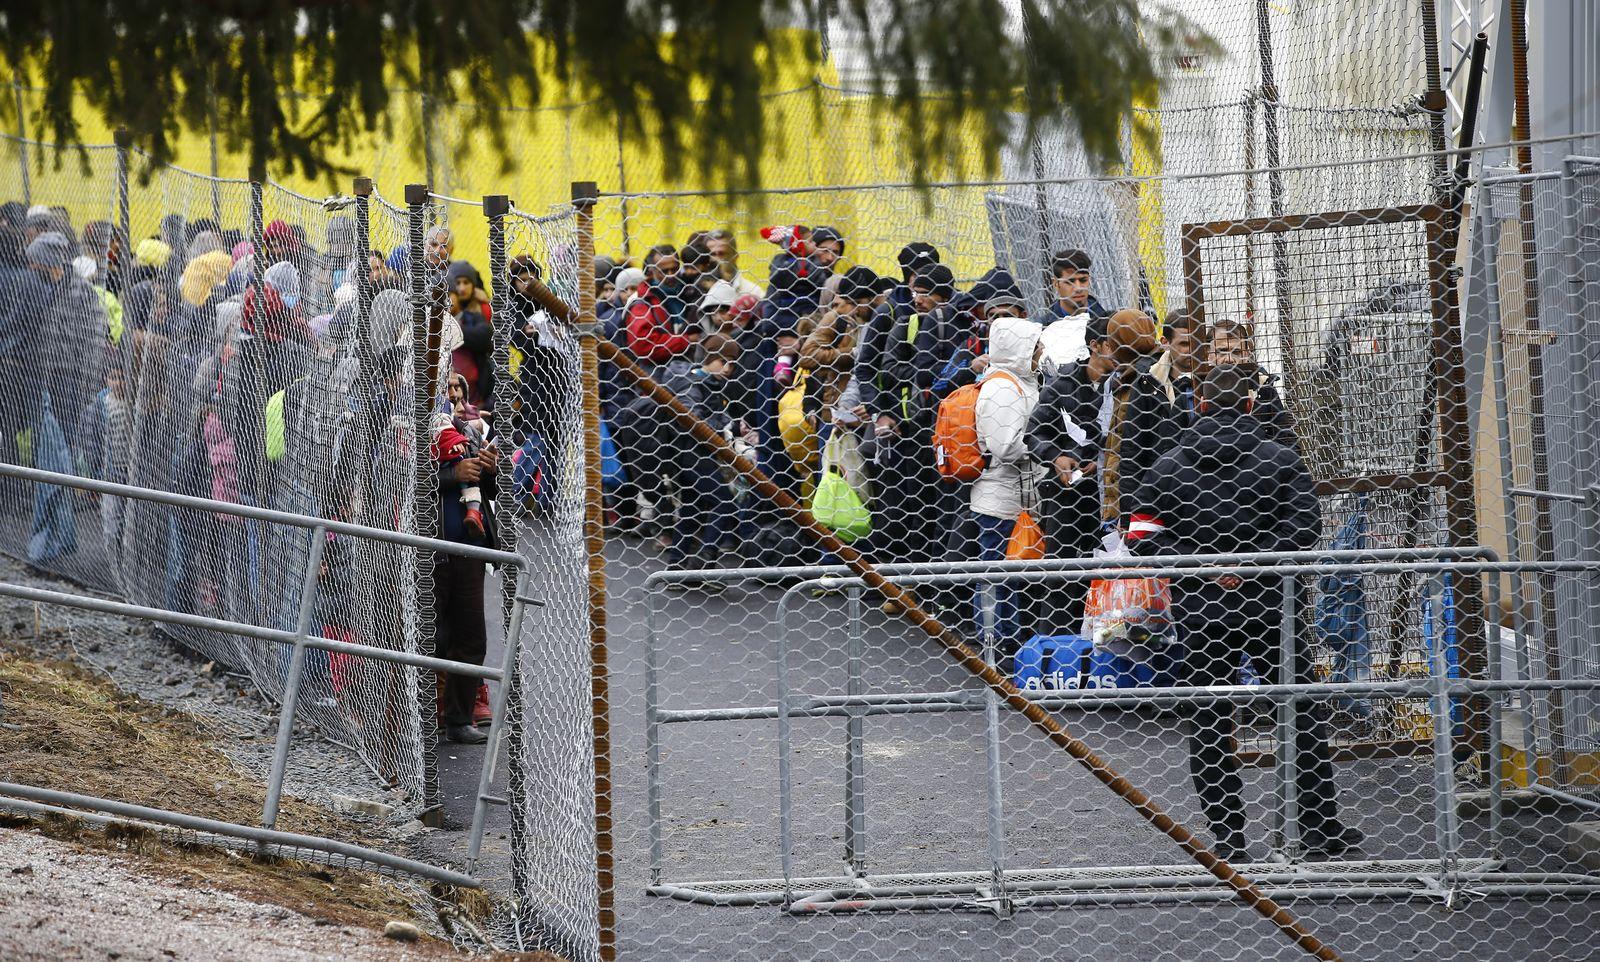 Österreich/ Sozialhilfe/ Flüchtlinge